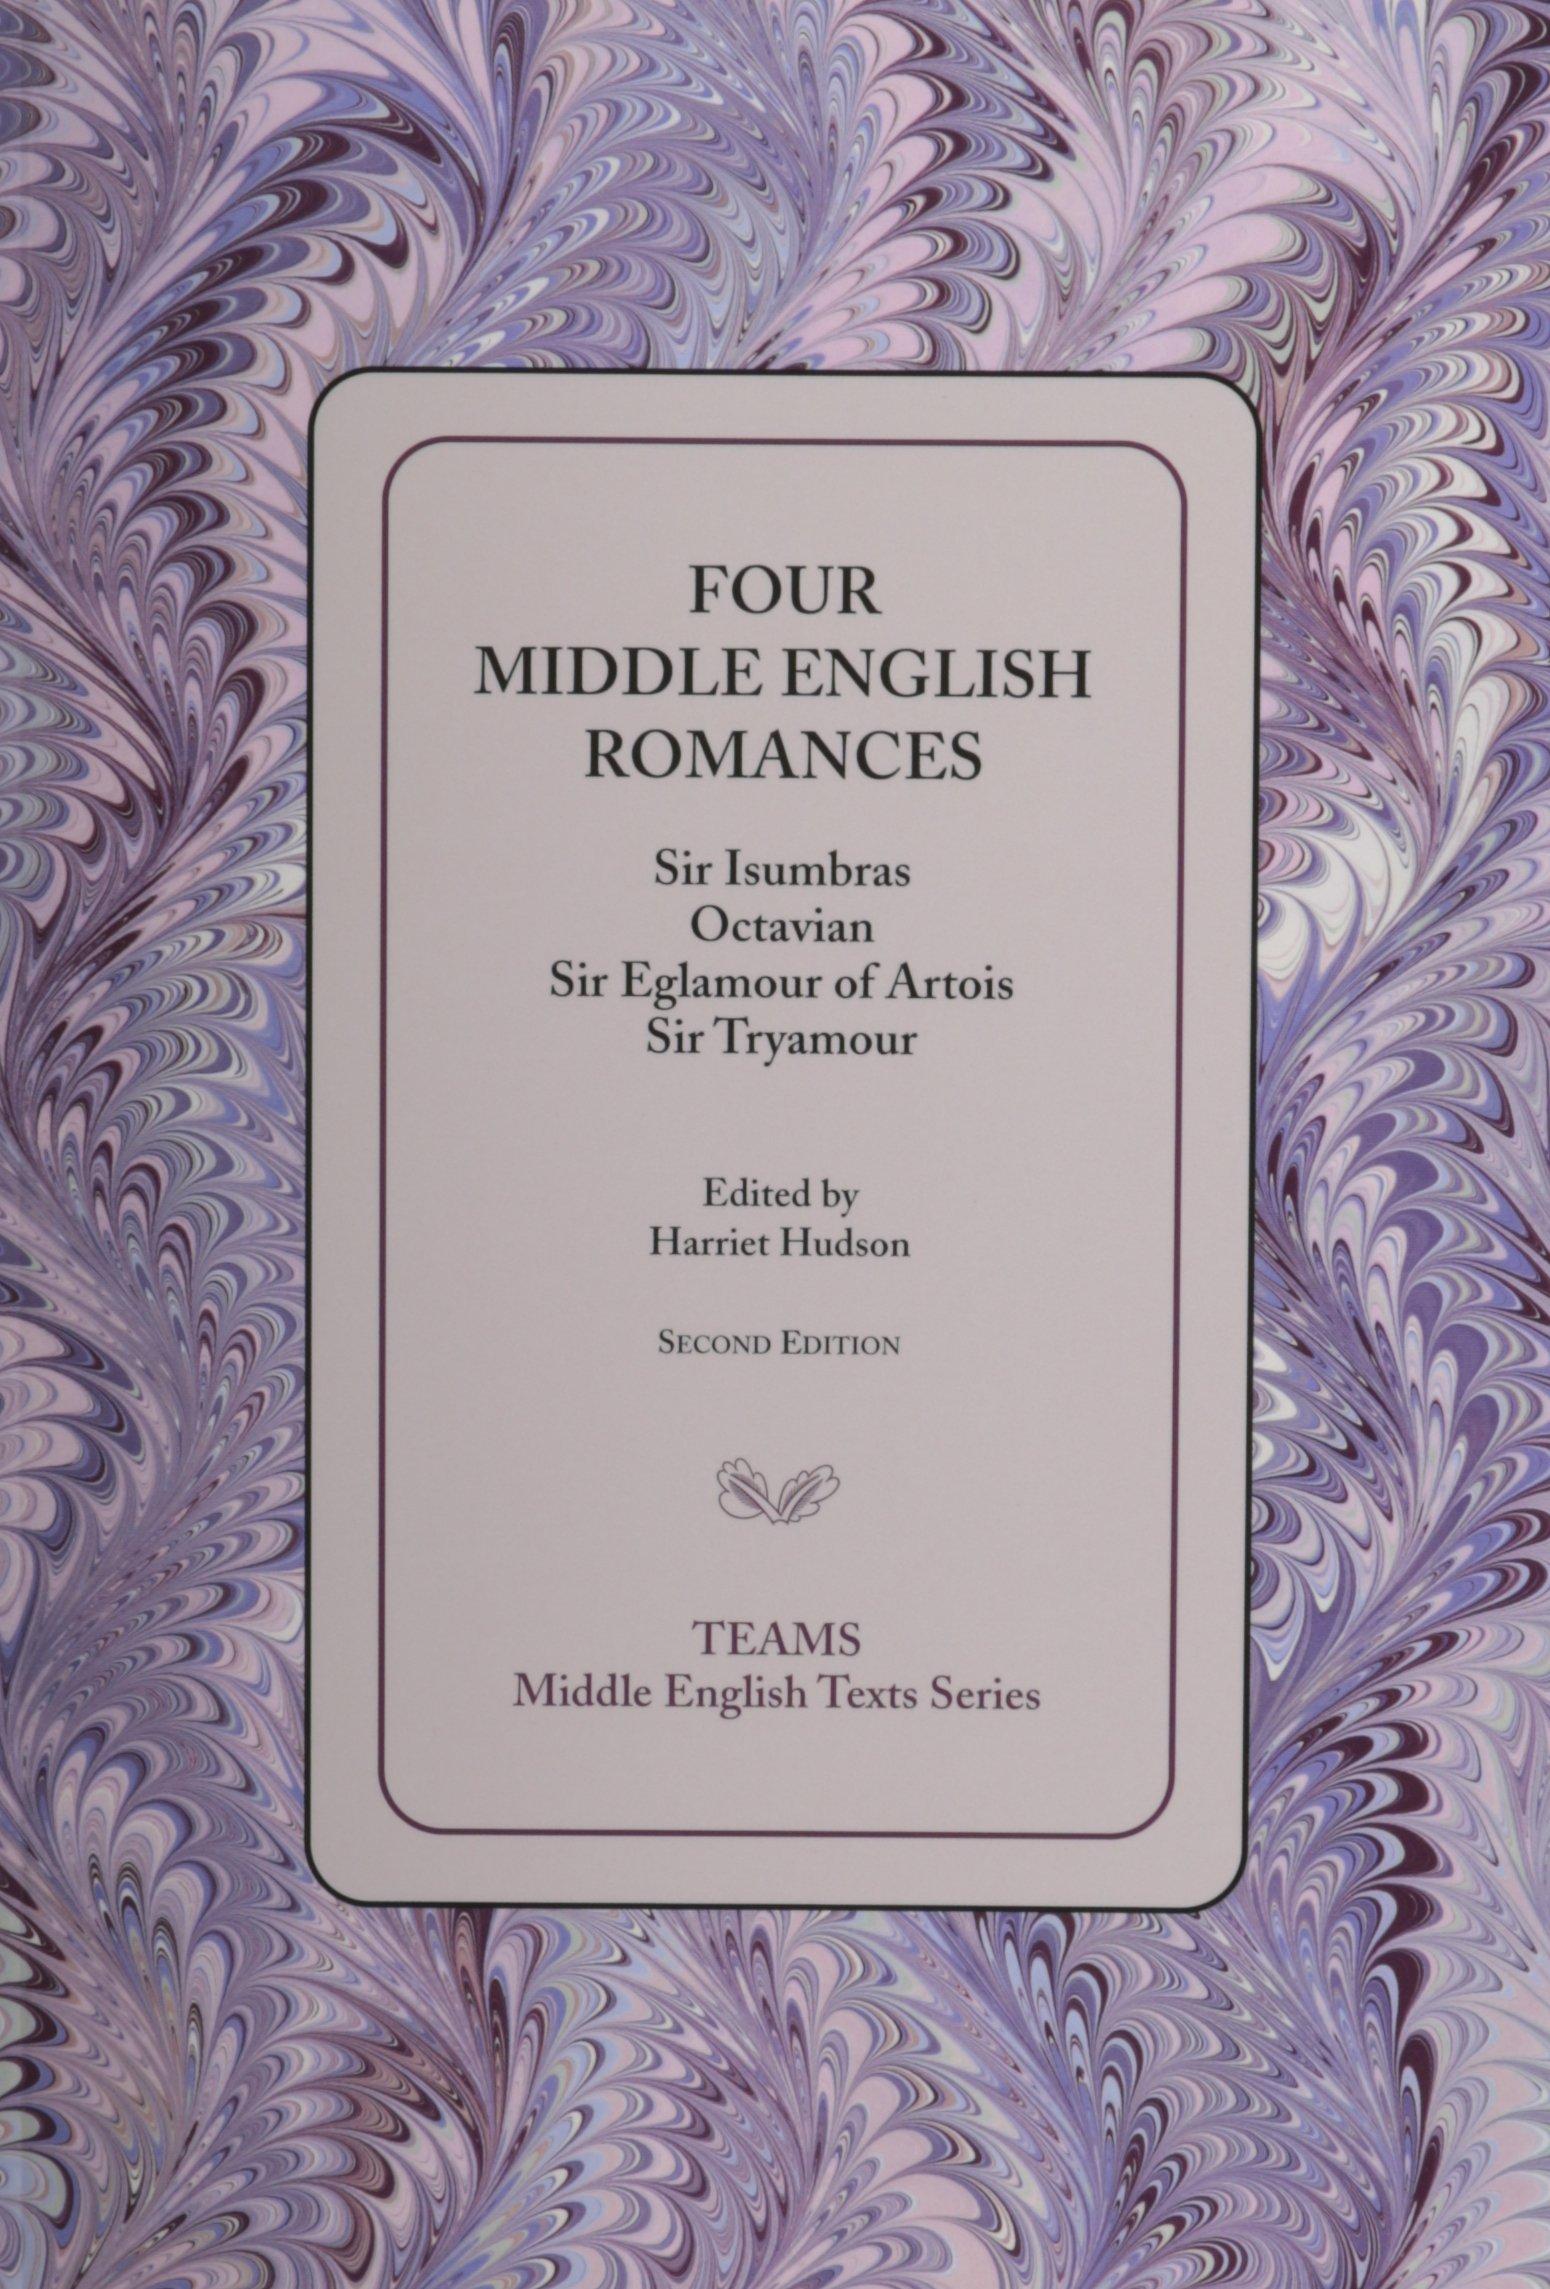 amazon four middle english romances sir isumbras octavian sir